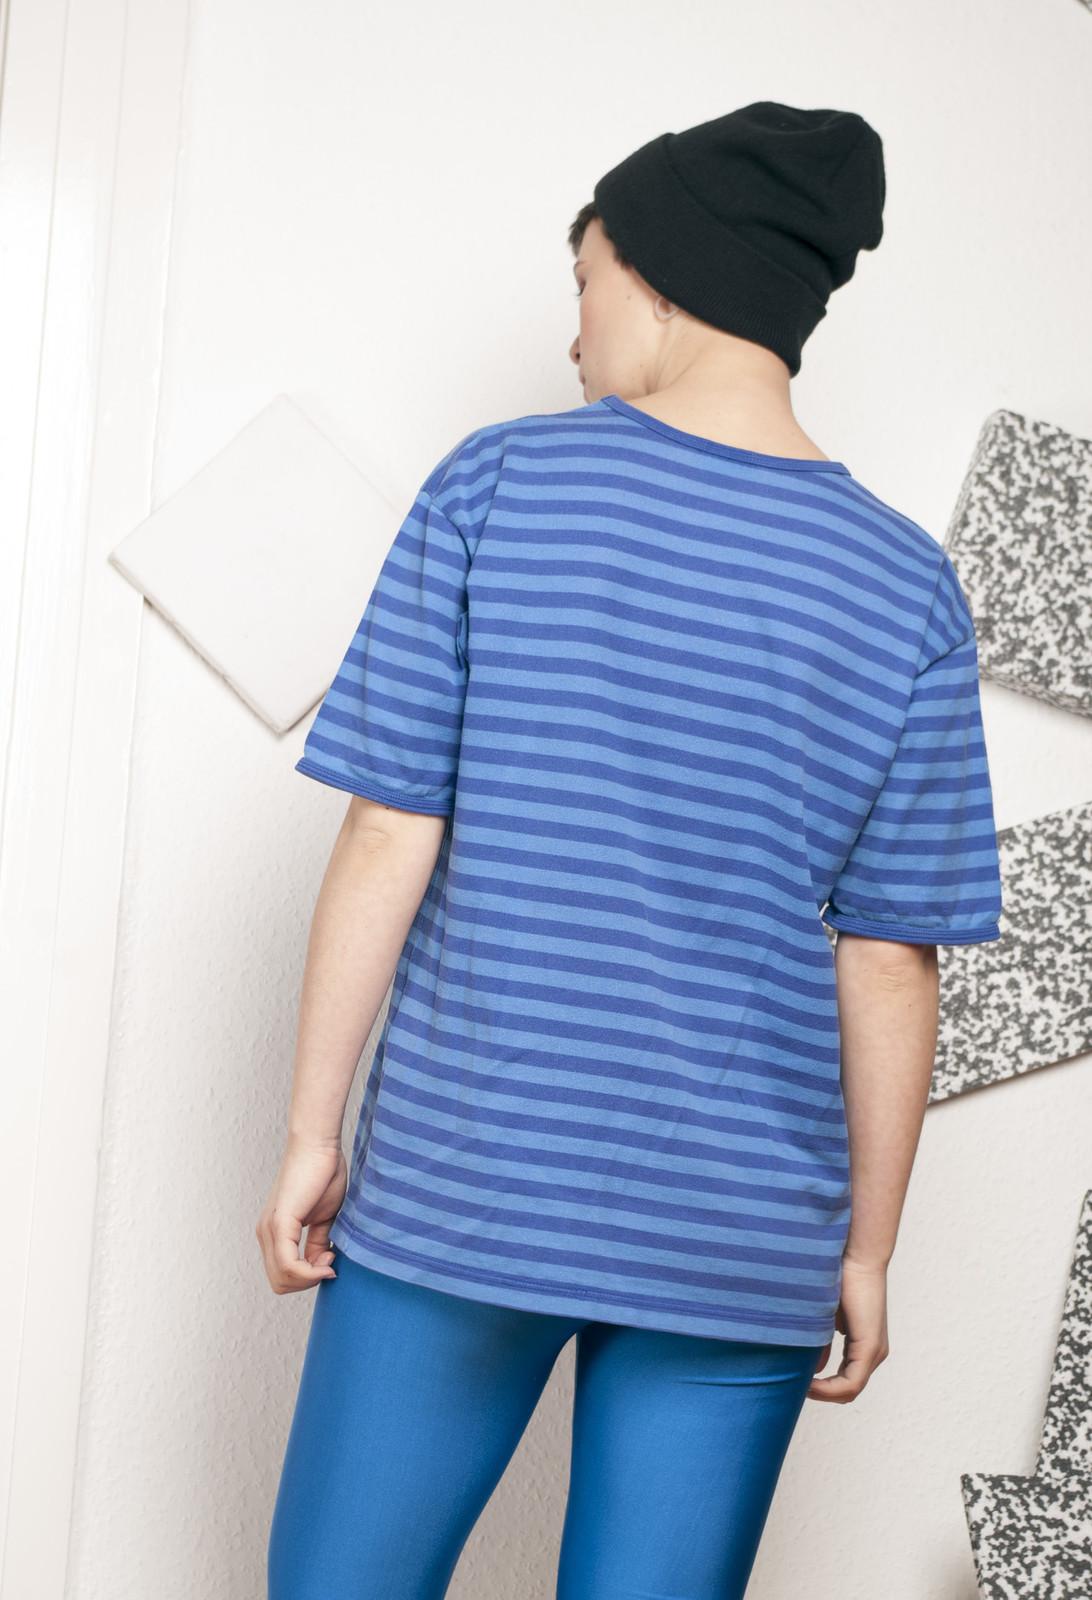 4e42f56ae3 Marimekko t-shirt - 80s vintage striped tee and similar items. Hd